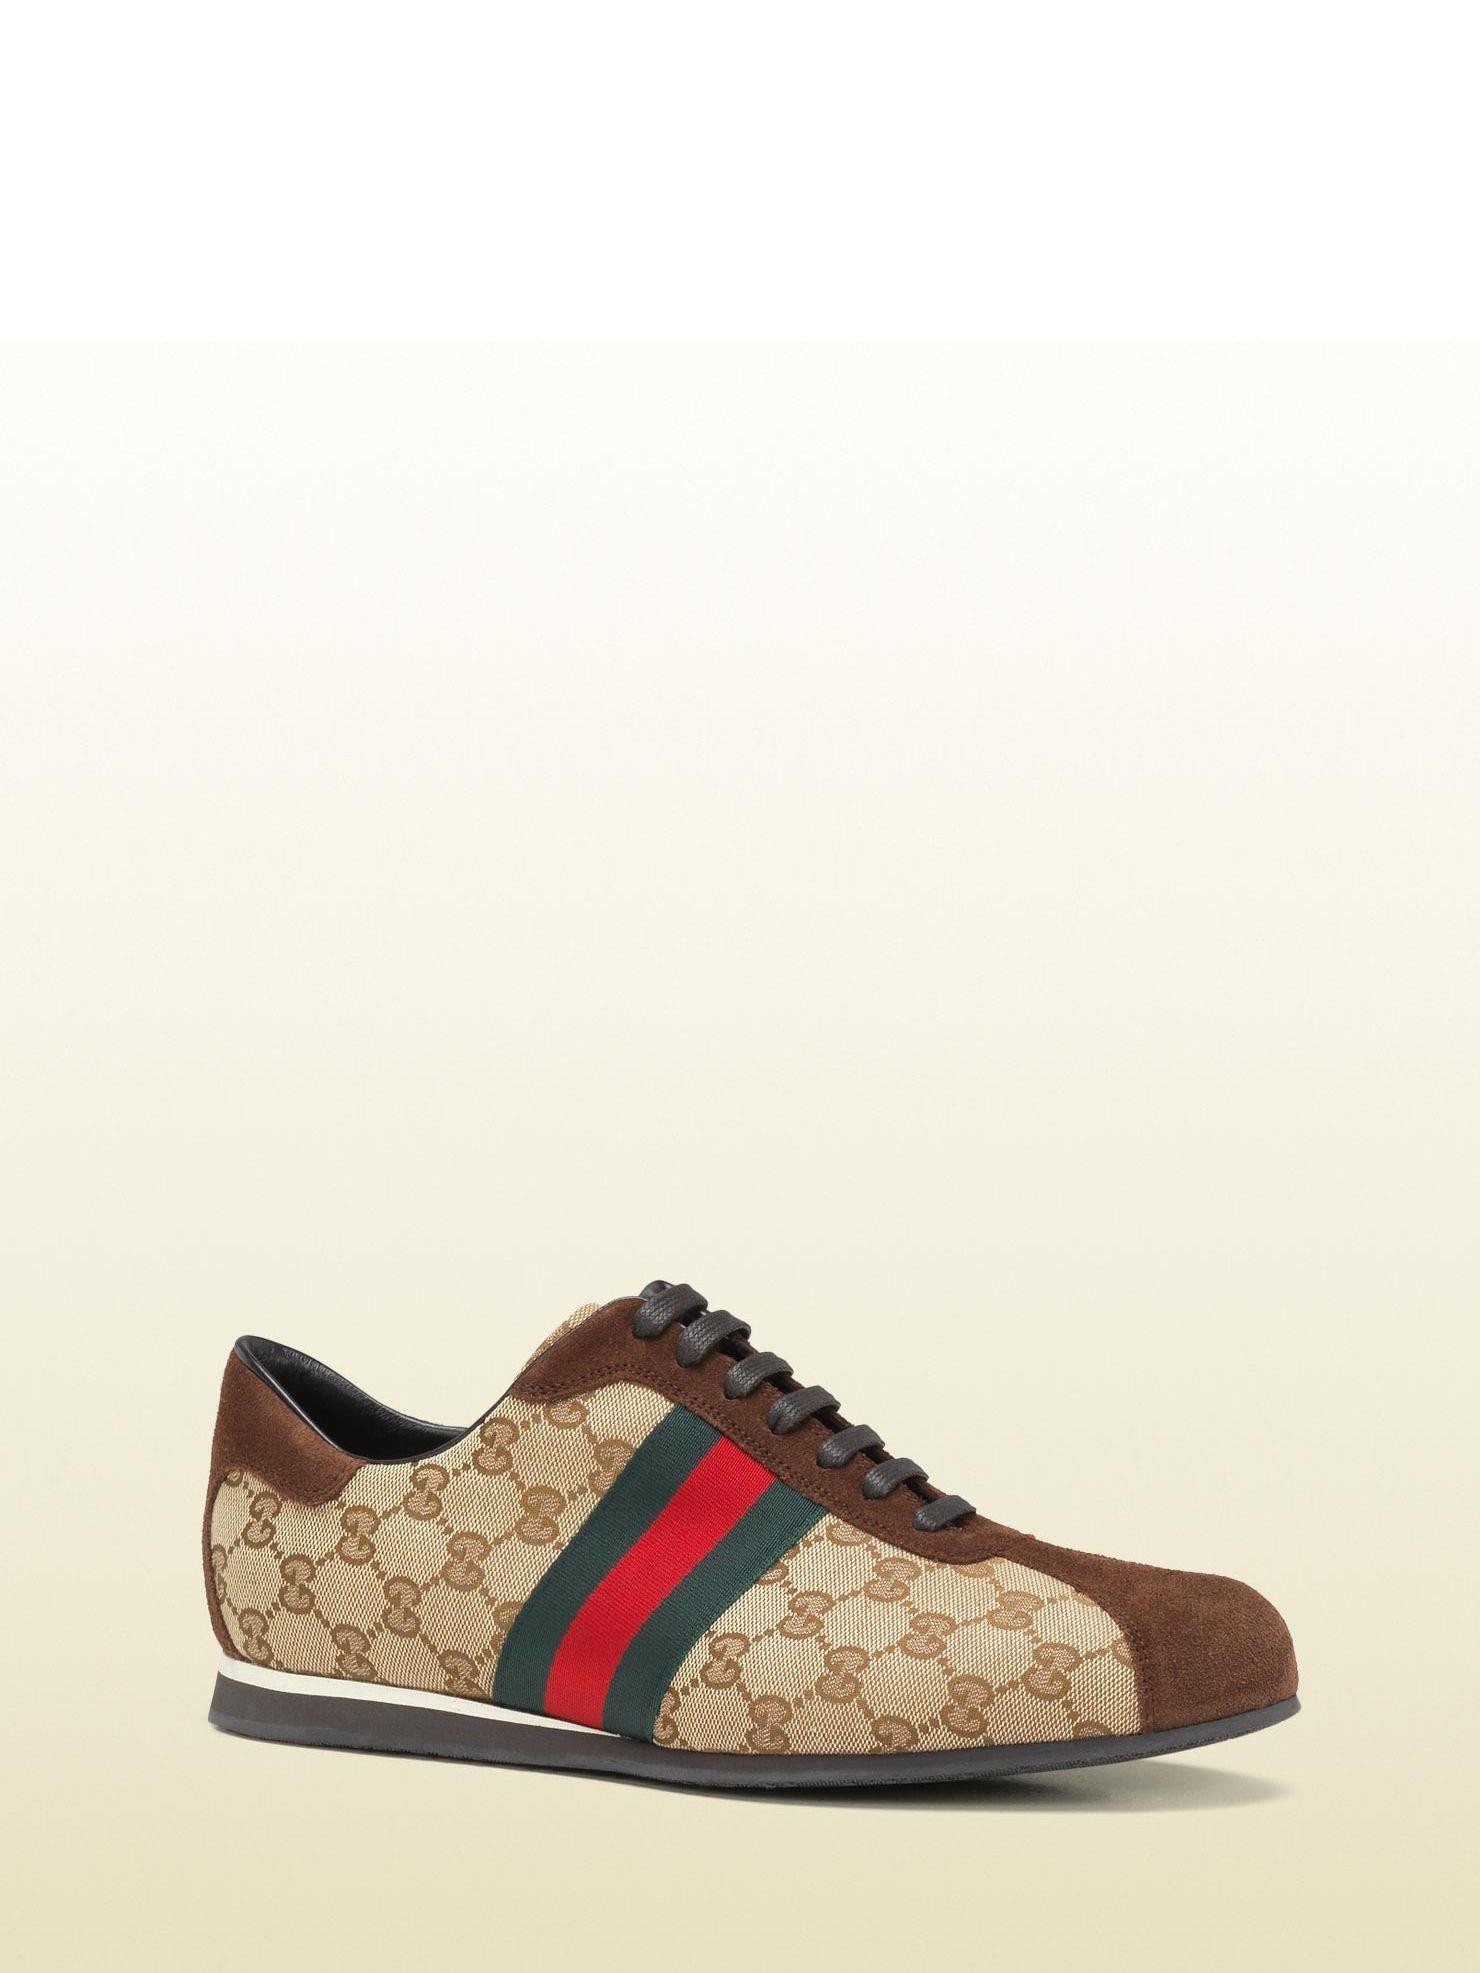 Original GG and suede Web sneaker - Brown Gucci rOWebMAL8